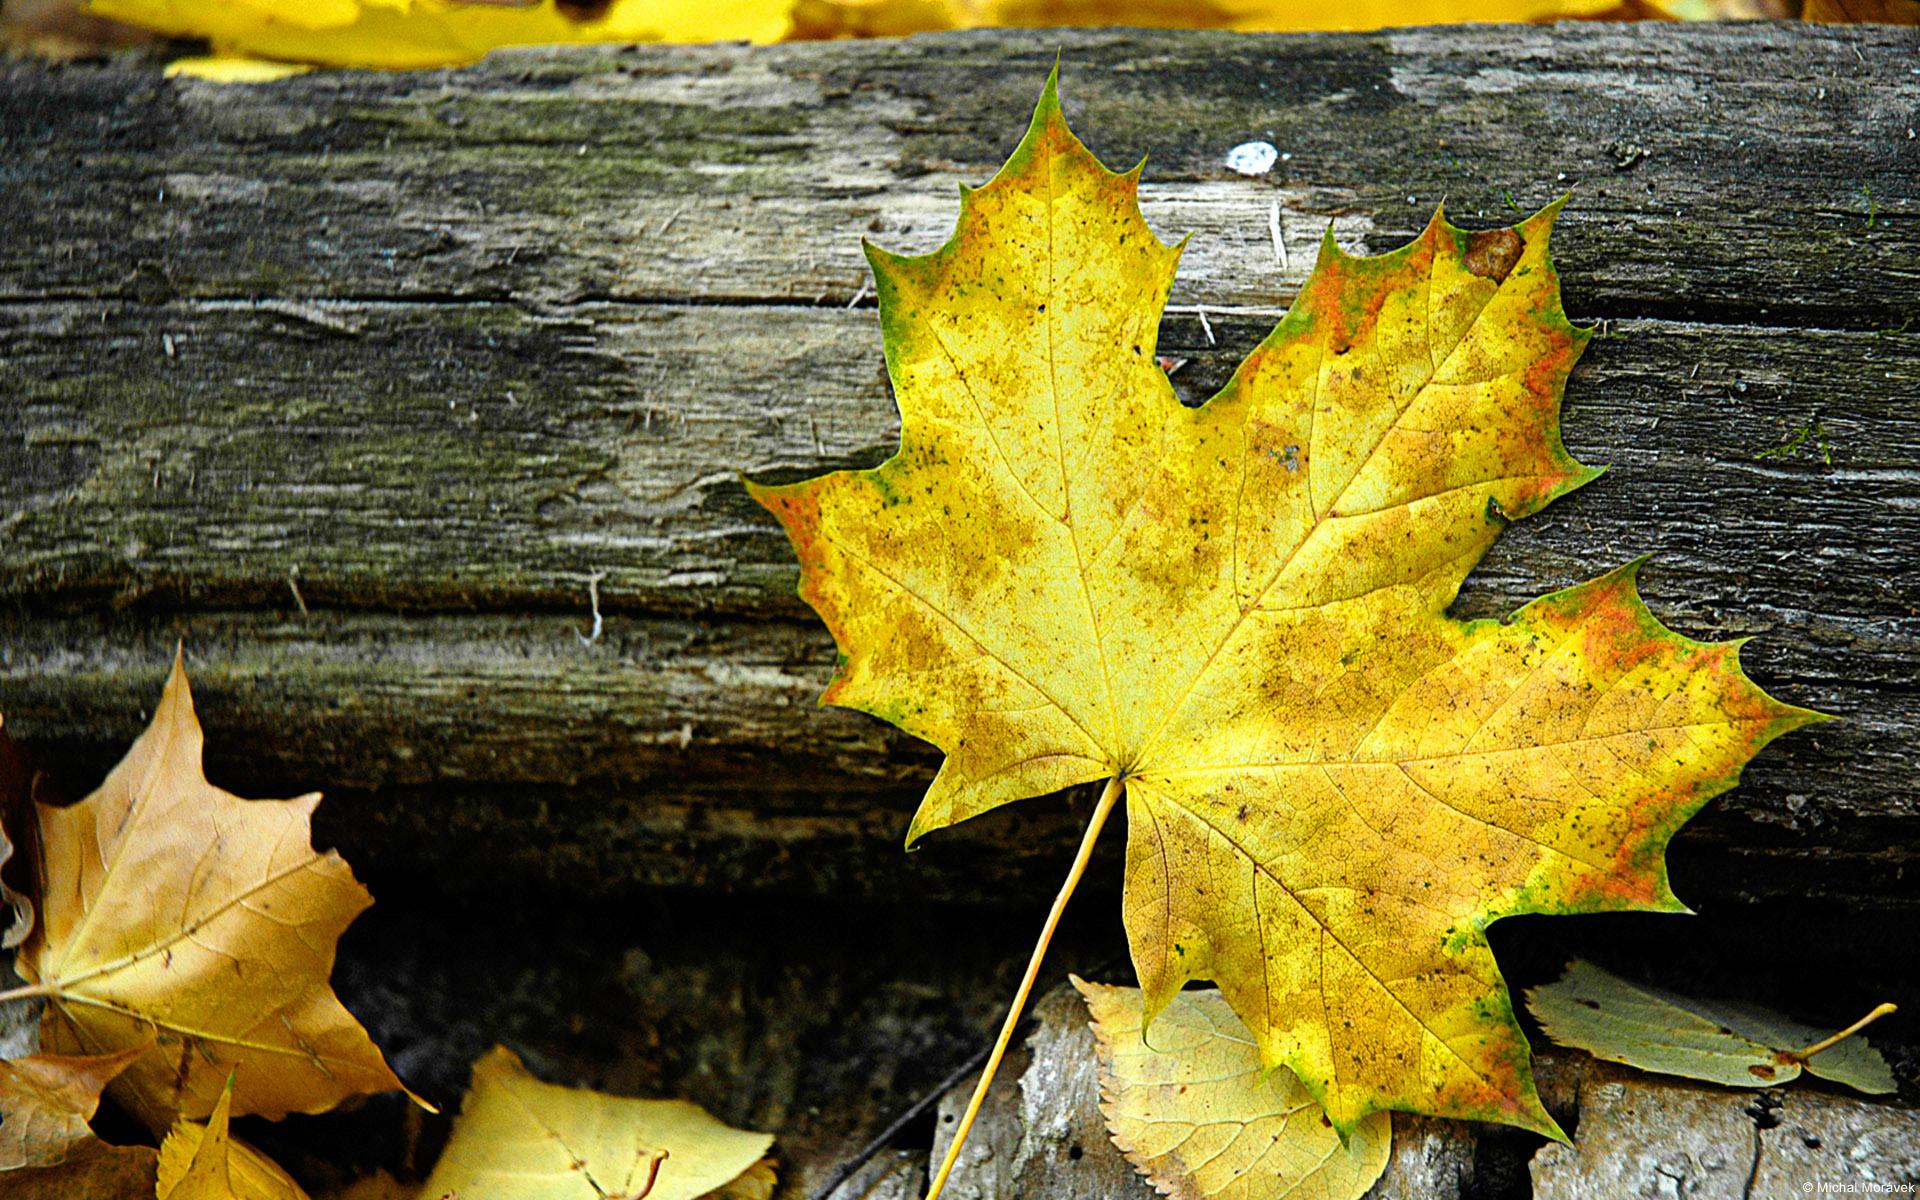 Autumn Leaves Windows 7 Desktop Backgrounds WindowsObservercom 1920x1200